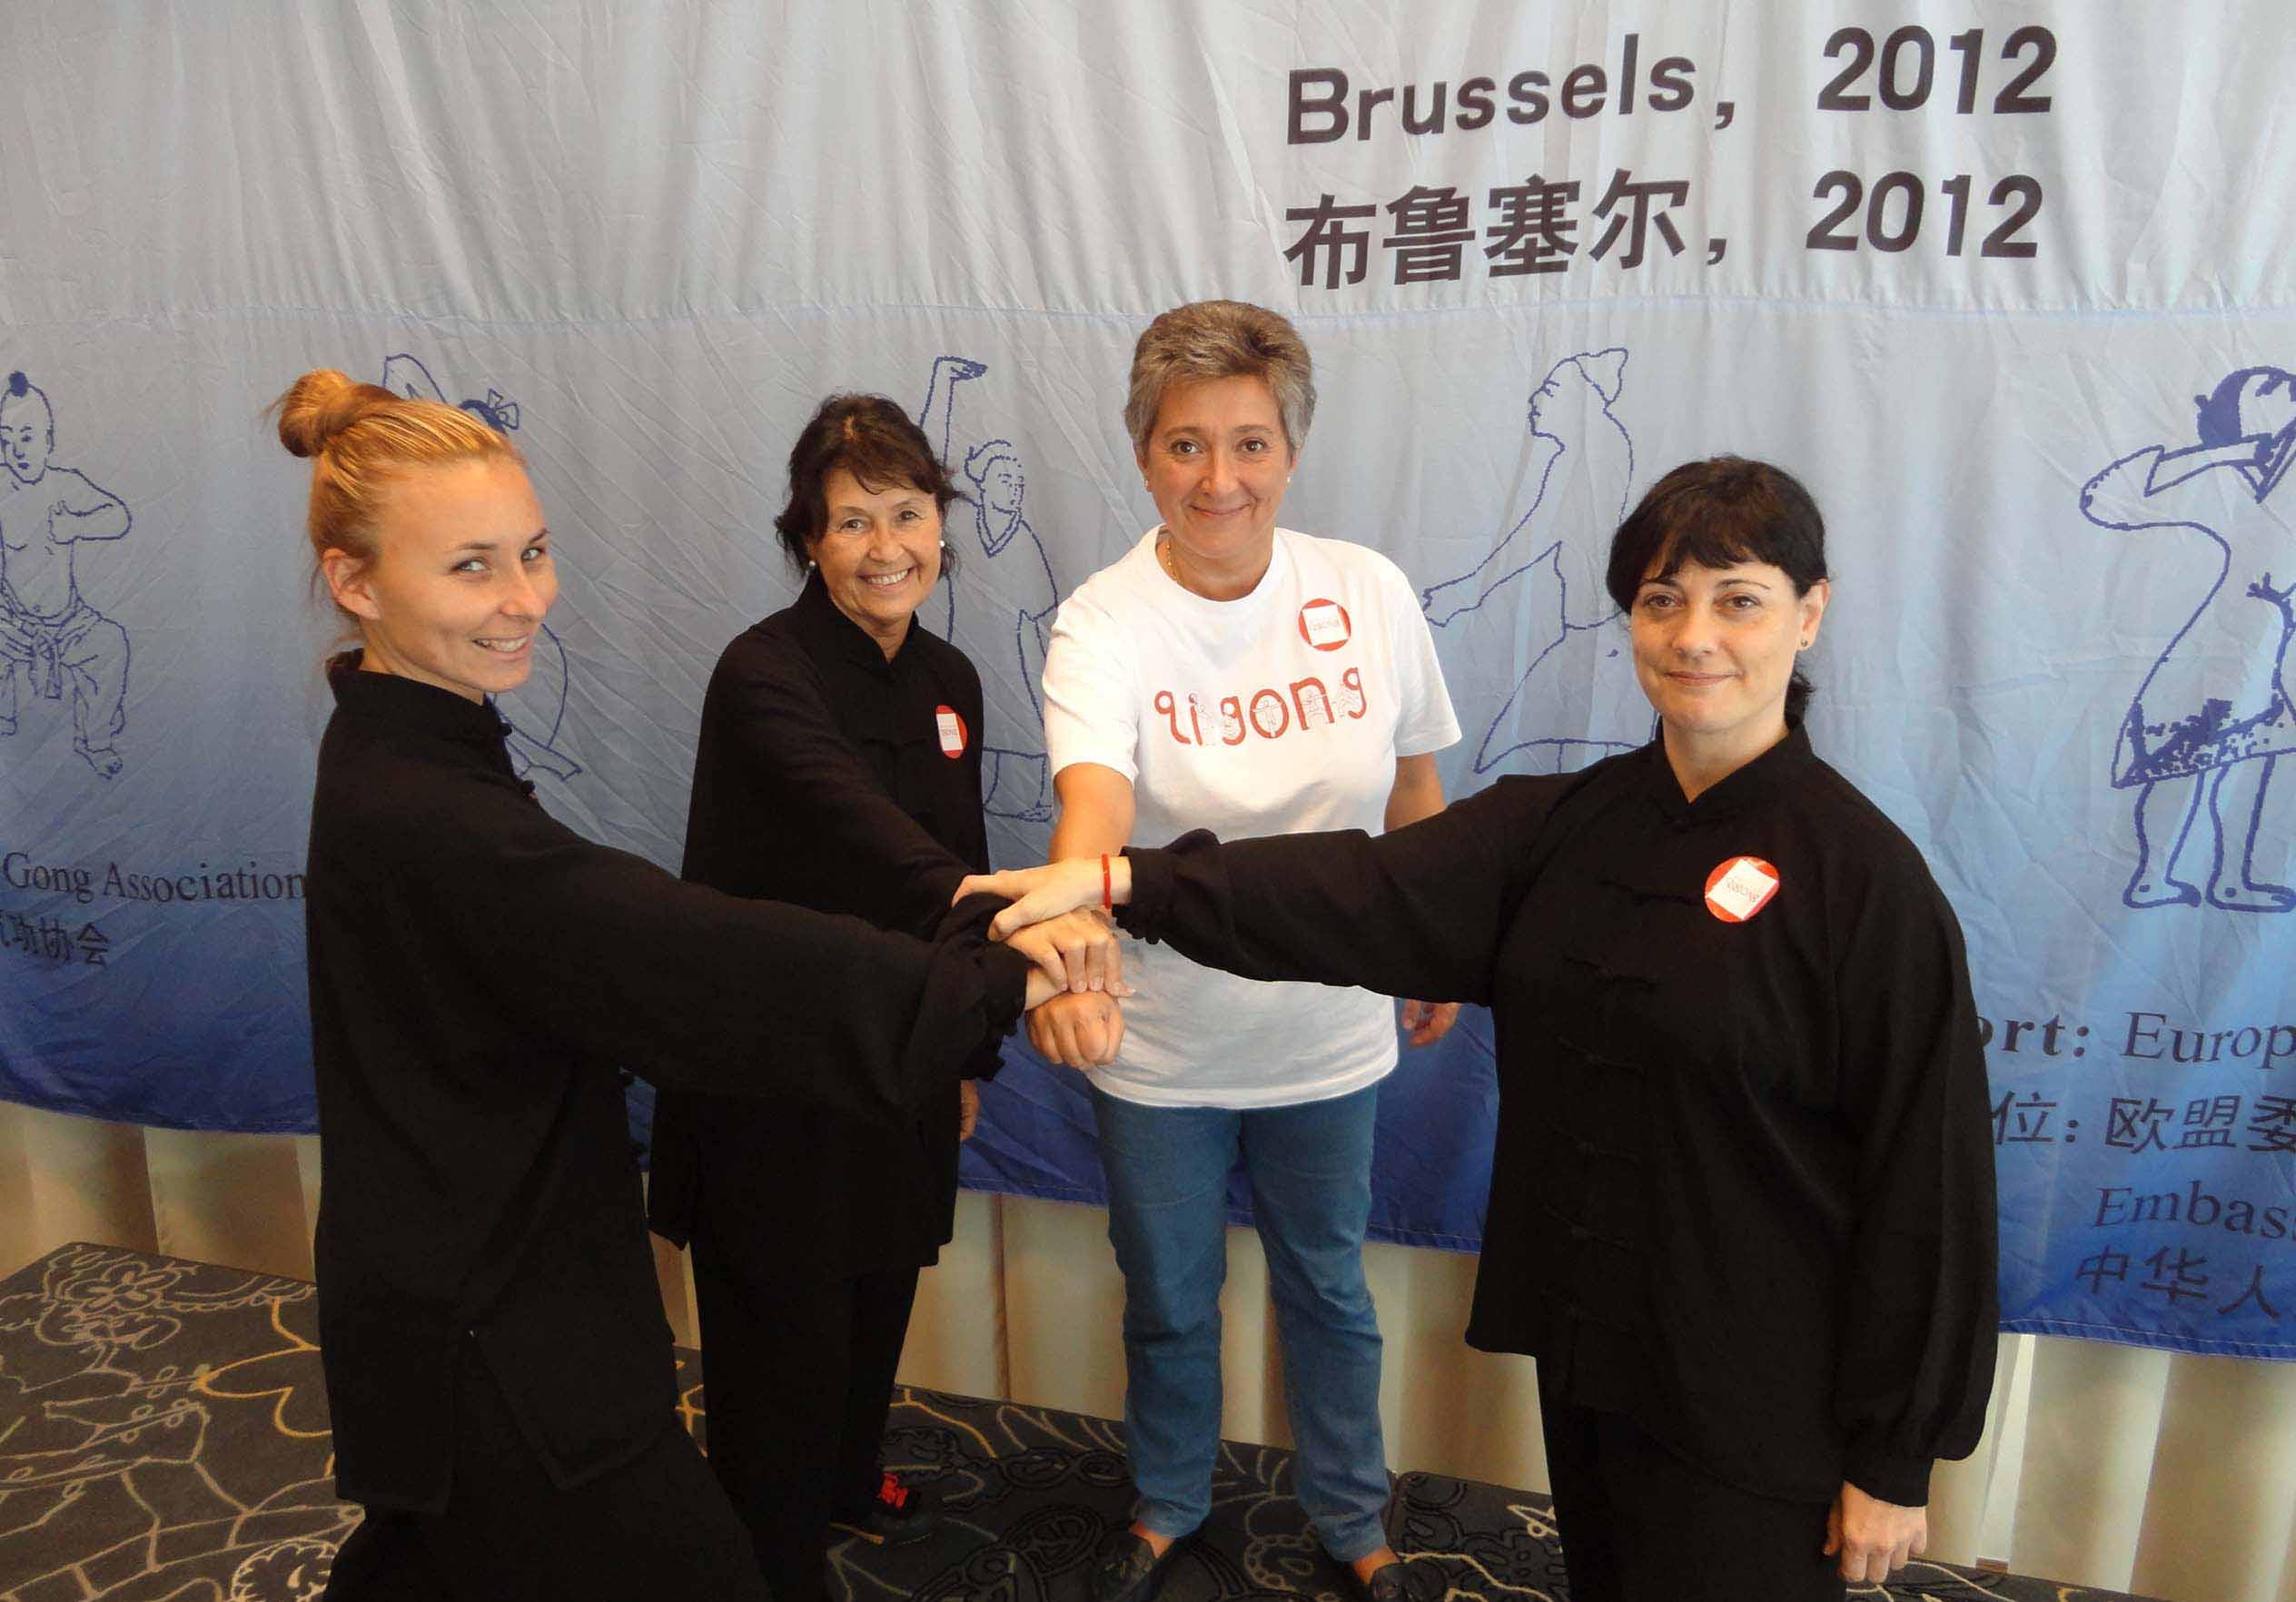 Exámenes de Nivel Técnico Duan, Bruselas